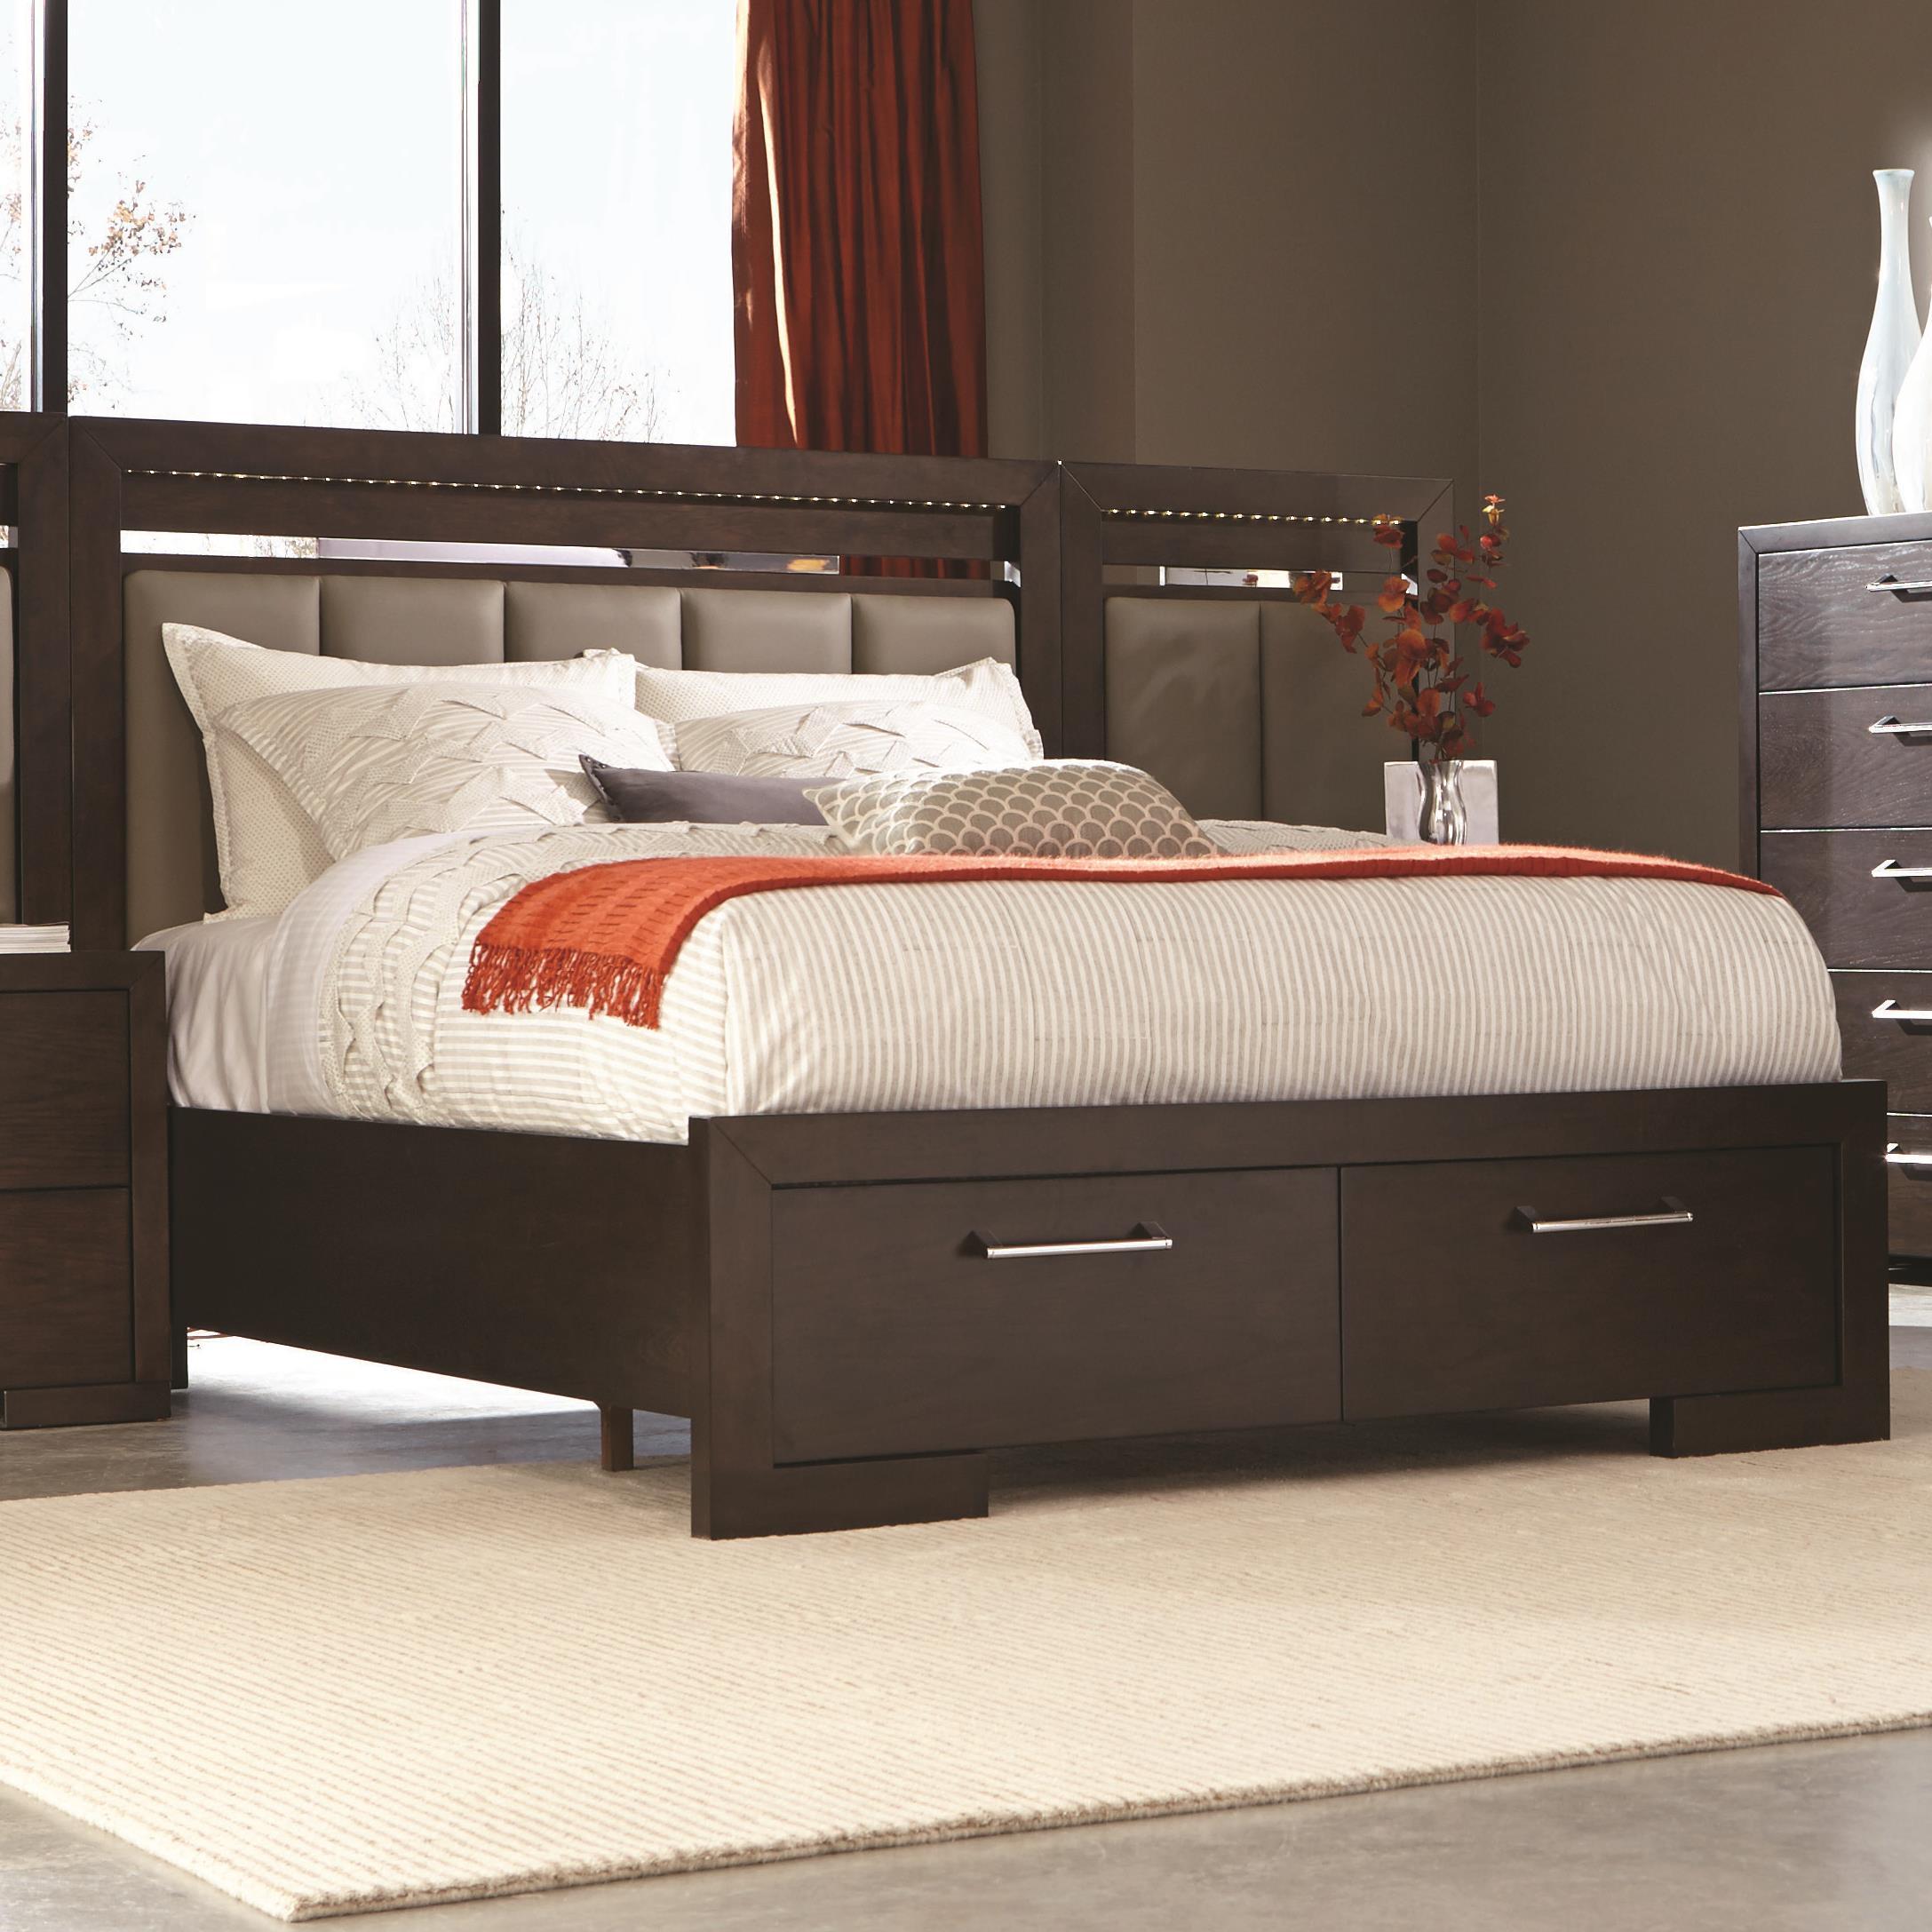 Coaster Berkshire King Storage Bed - Item Number: 204460KE